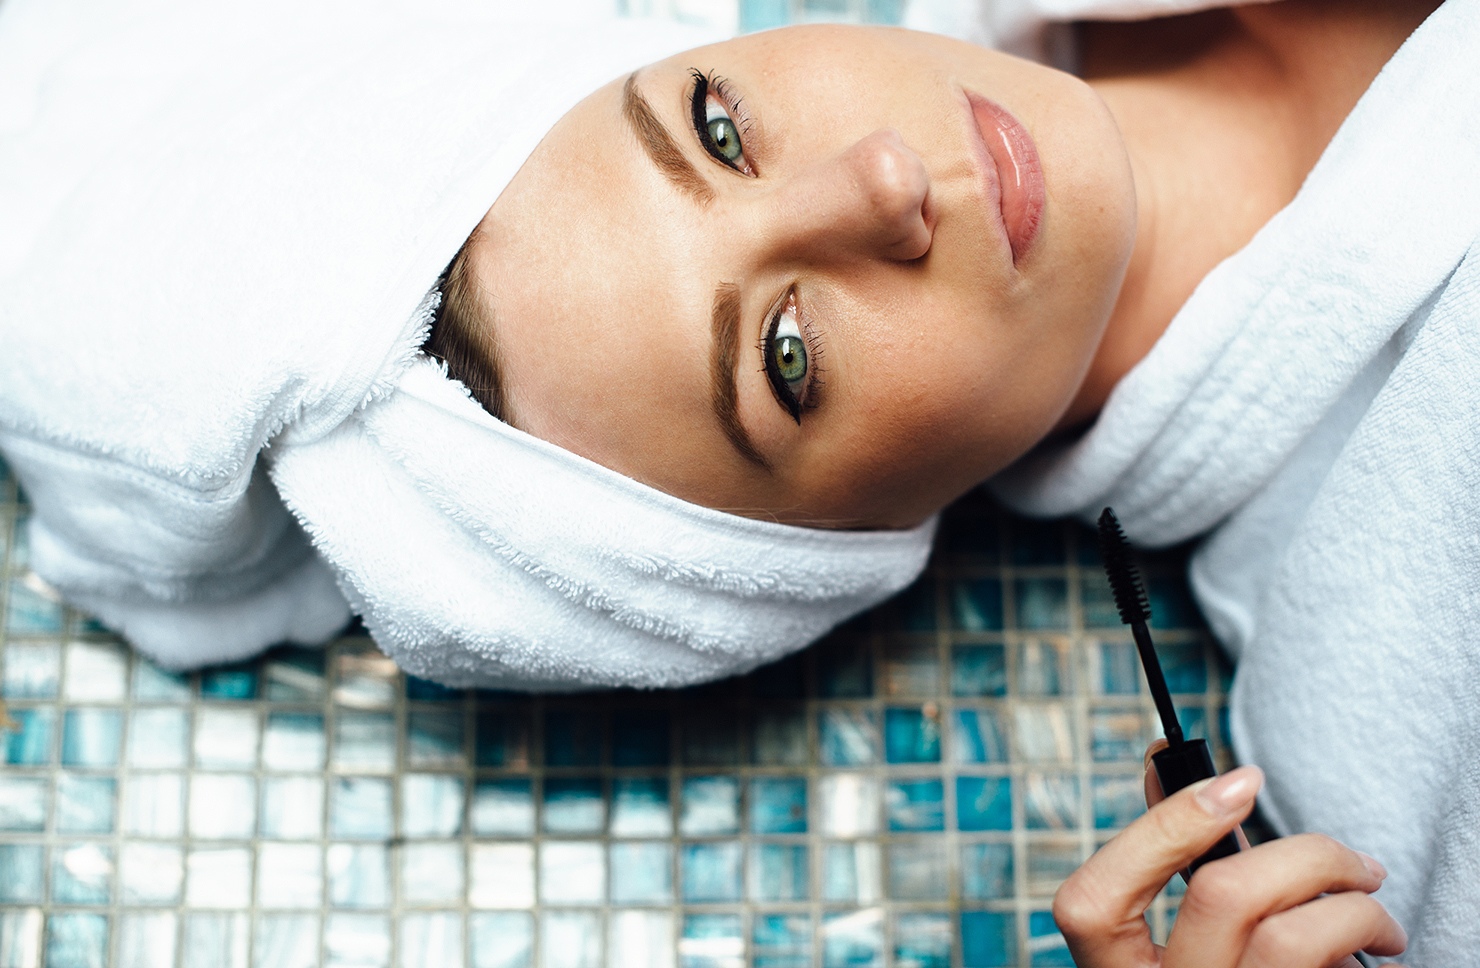 Kiamisu_Modeblog_Fashionblog_medipharma cosmetics_Mascara Med_Wimpern Booster_Erfahrungen_Test_Review-final